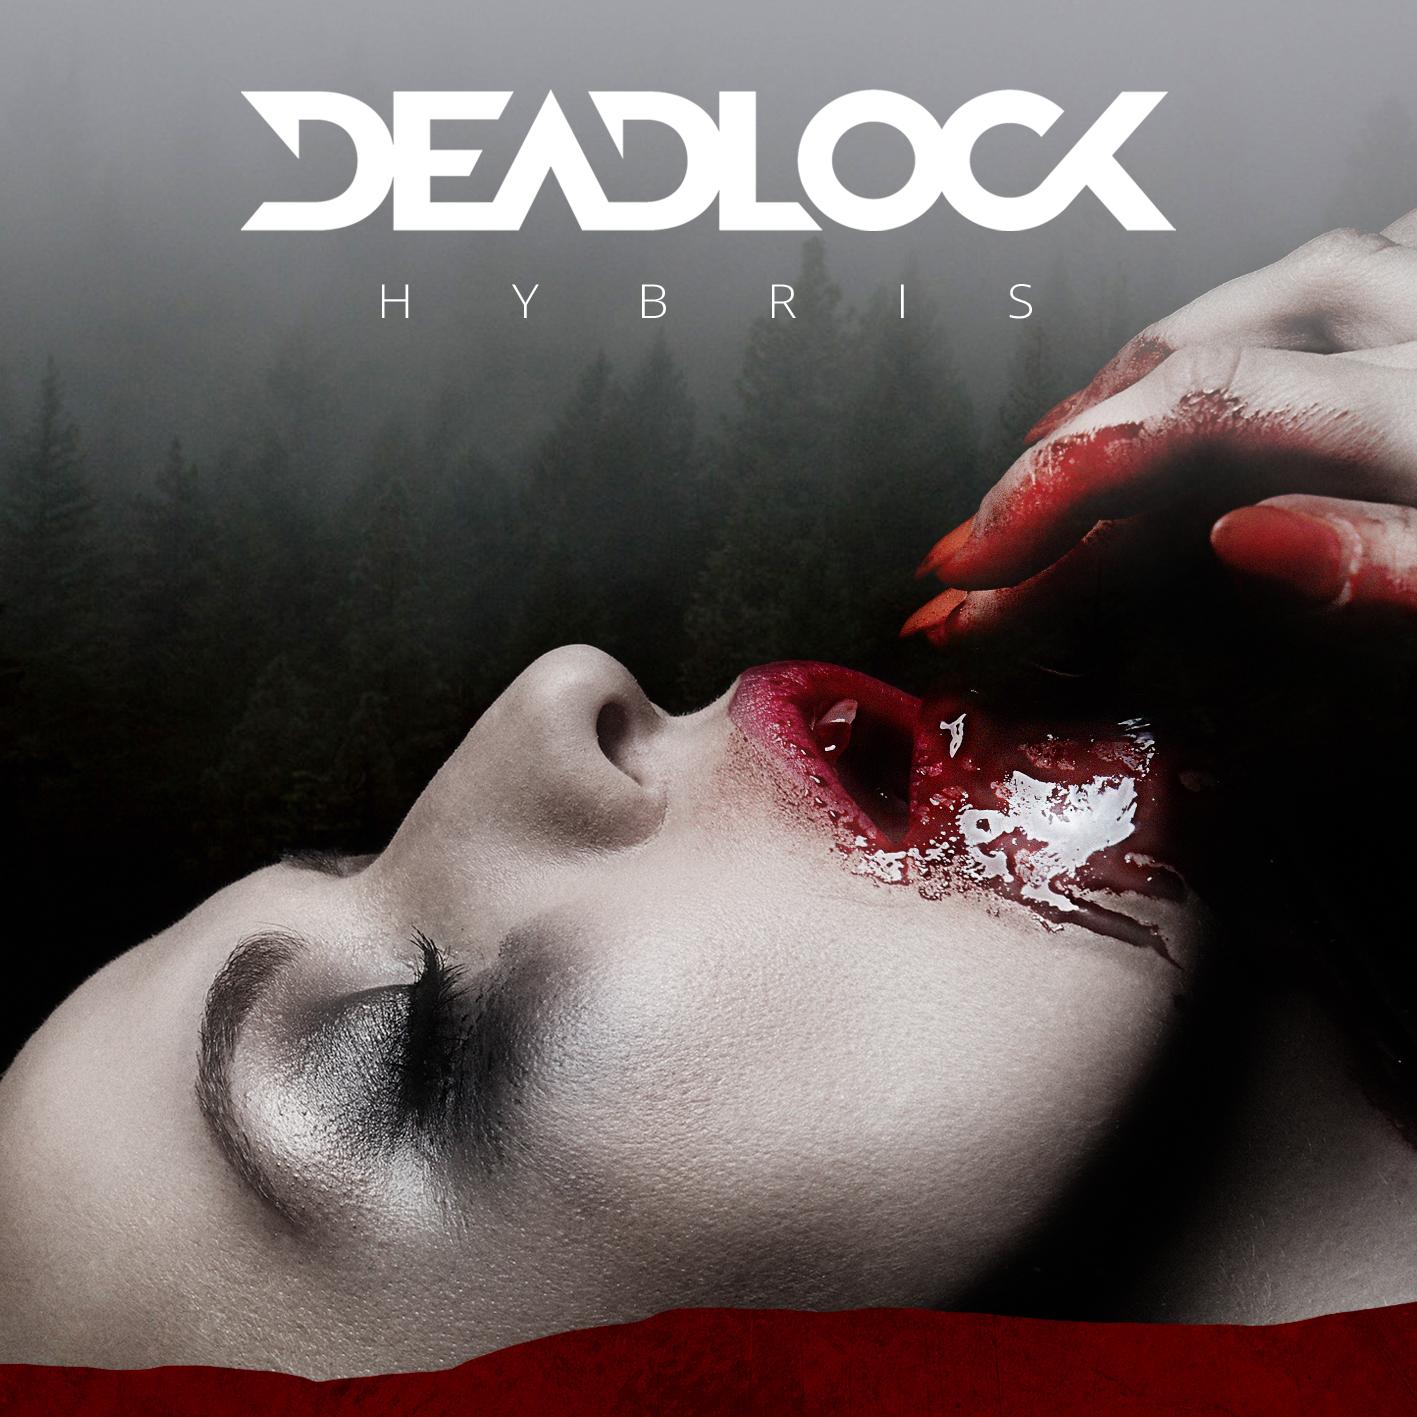 Deadlock _Hybris albumcover